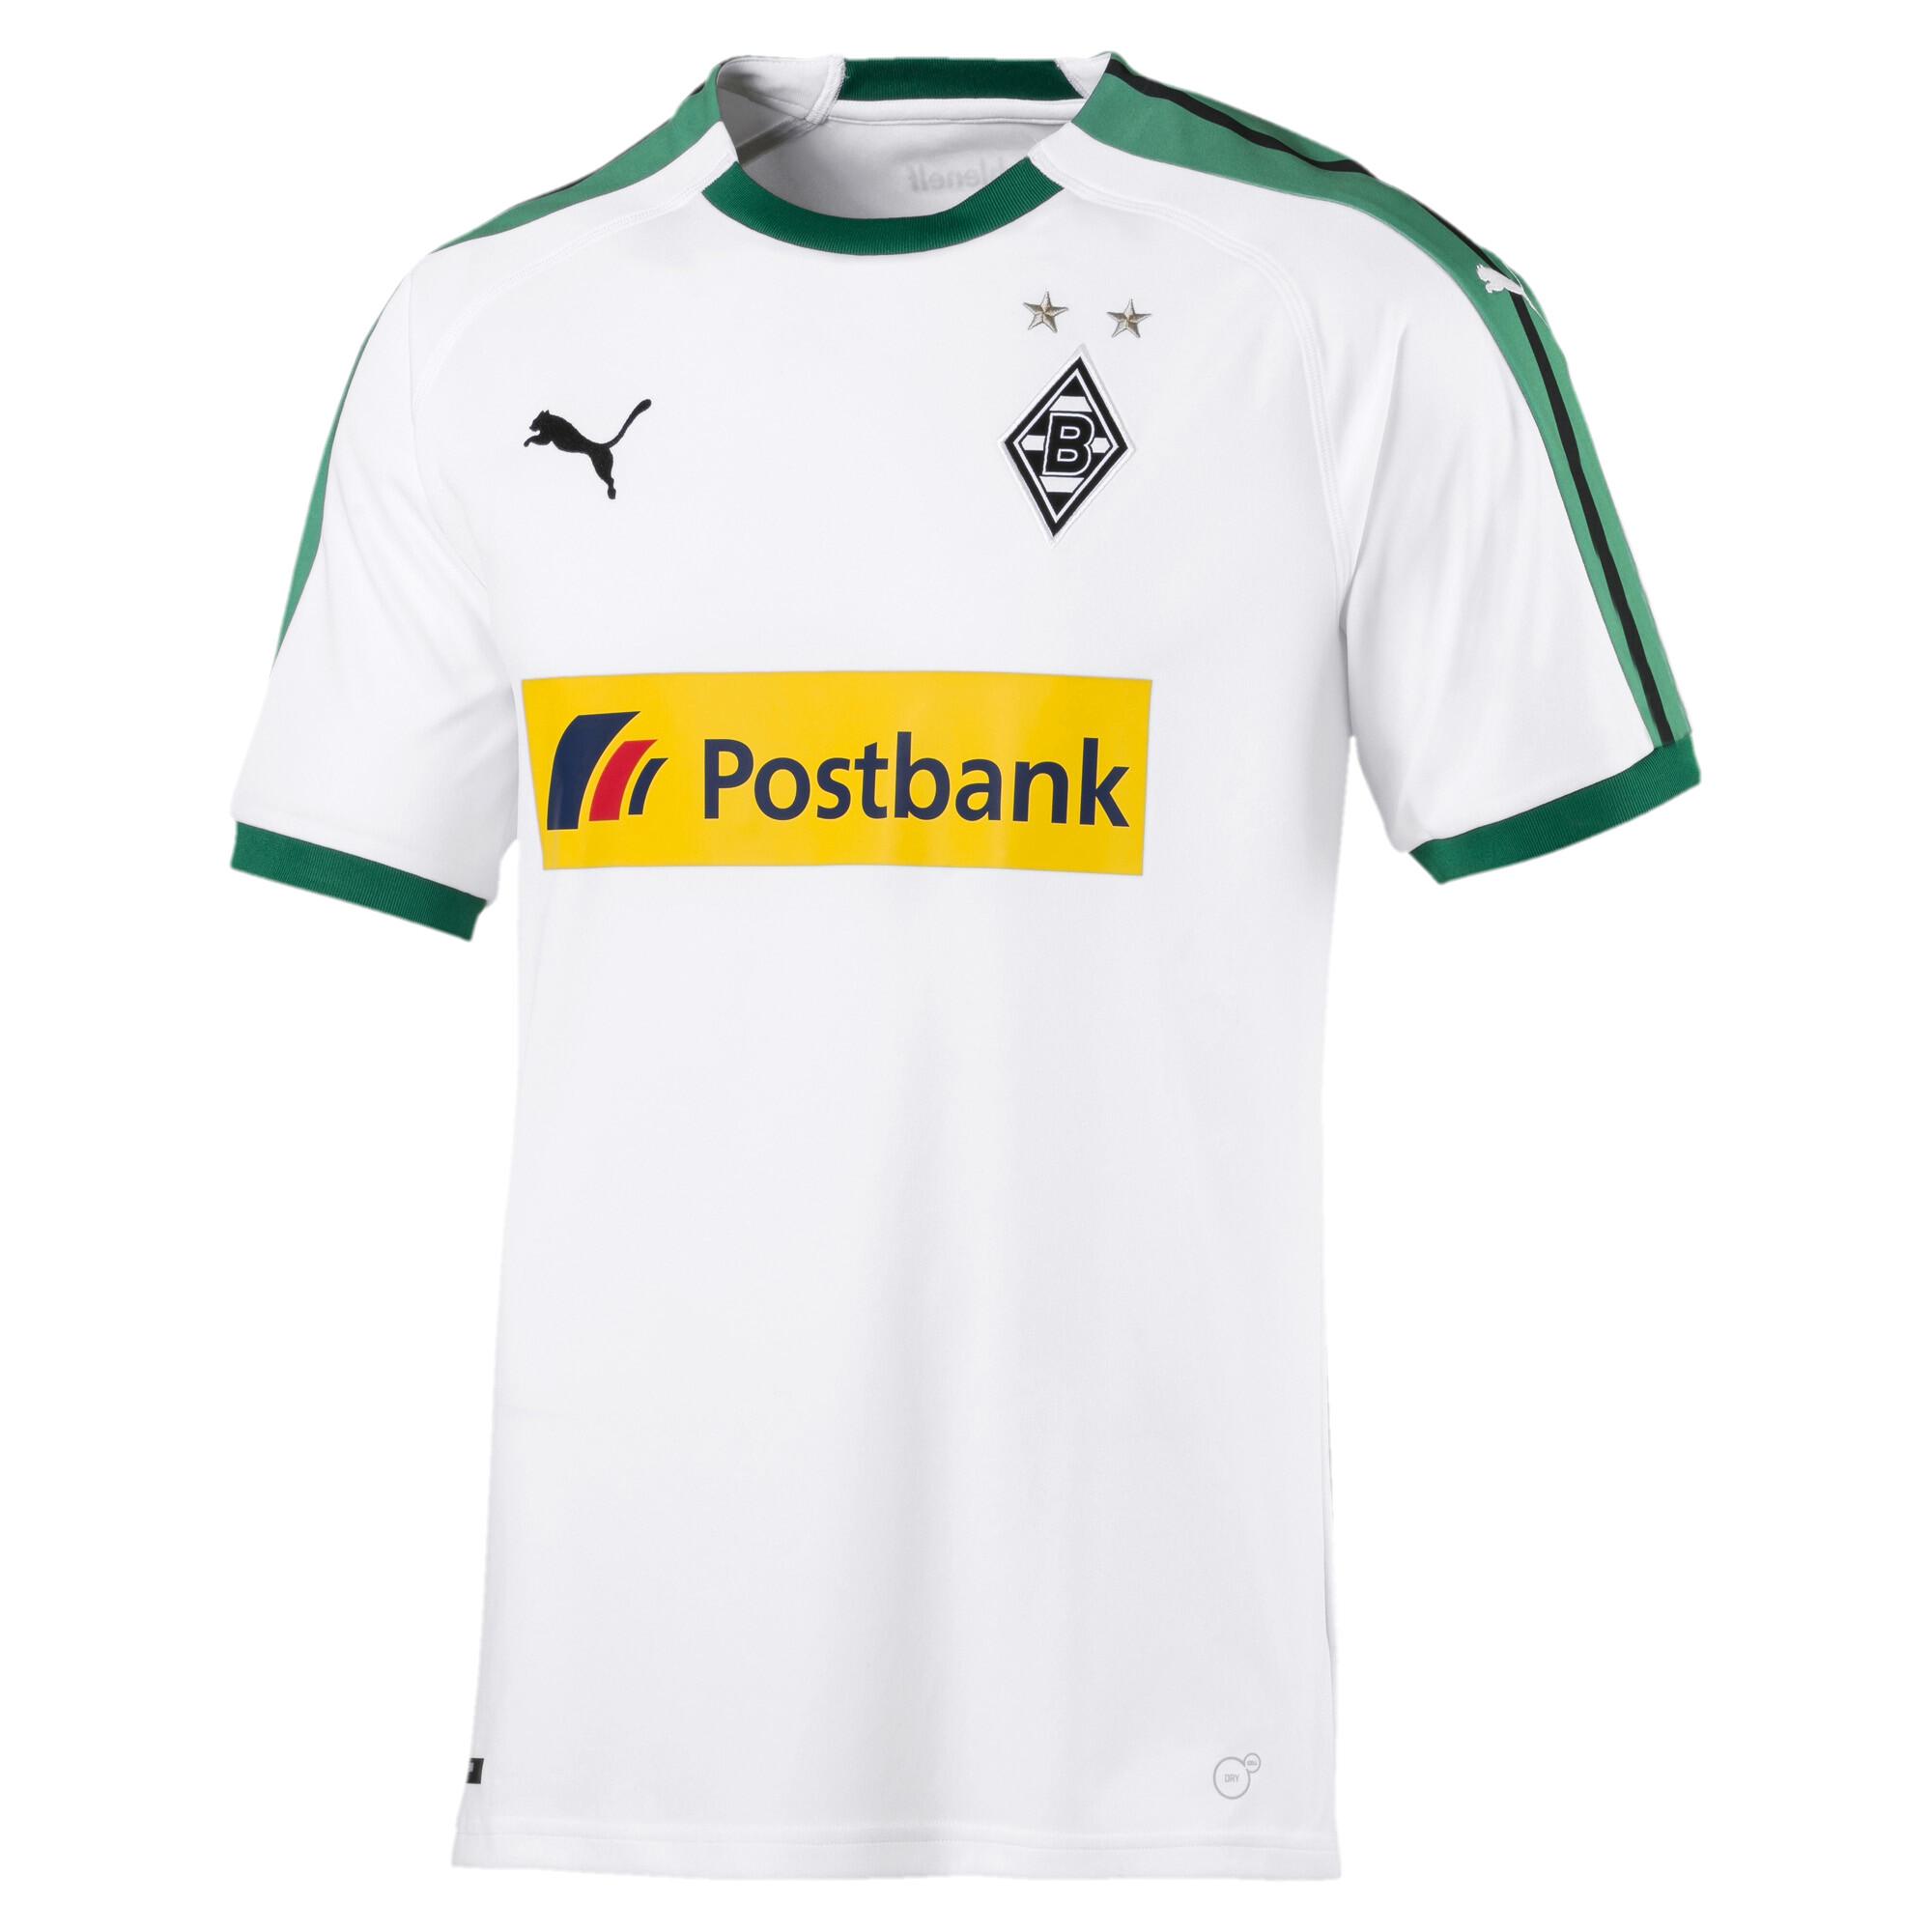 Indexbild 12 - PUMA Borussia Mönchengladbach Herren Replica Heimtrikot Männer Fußballtrikot Neu